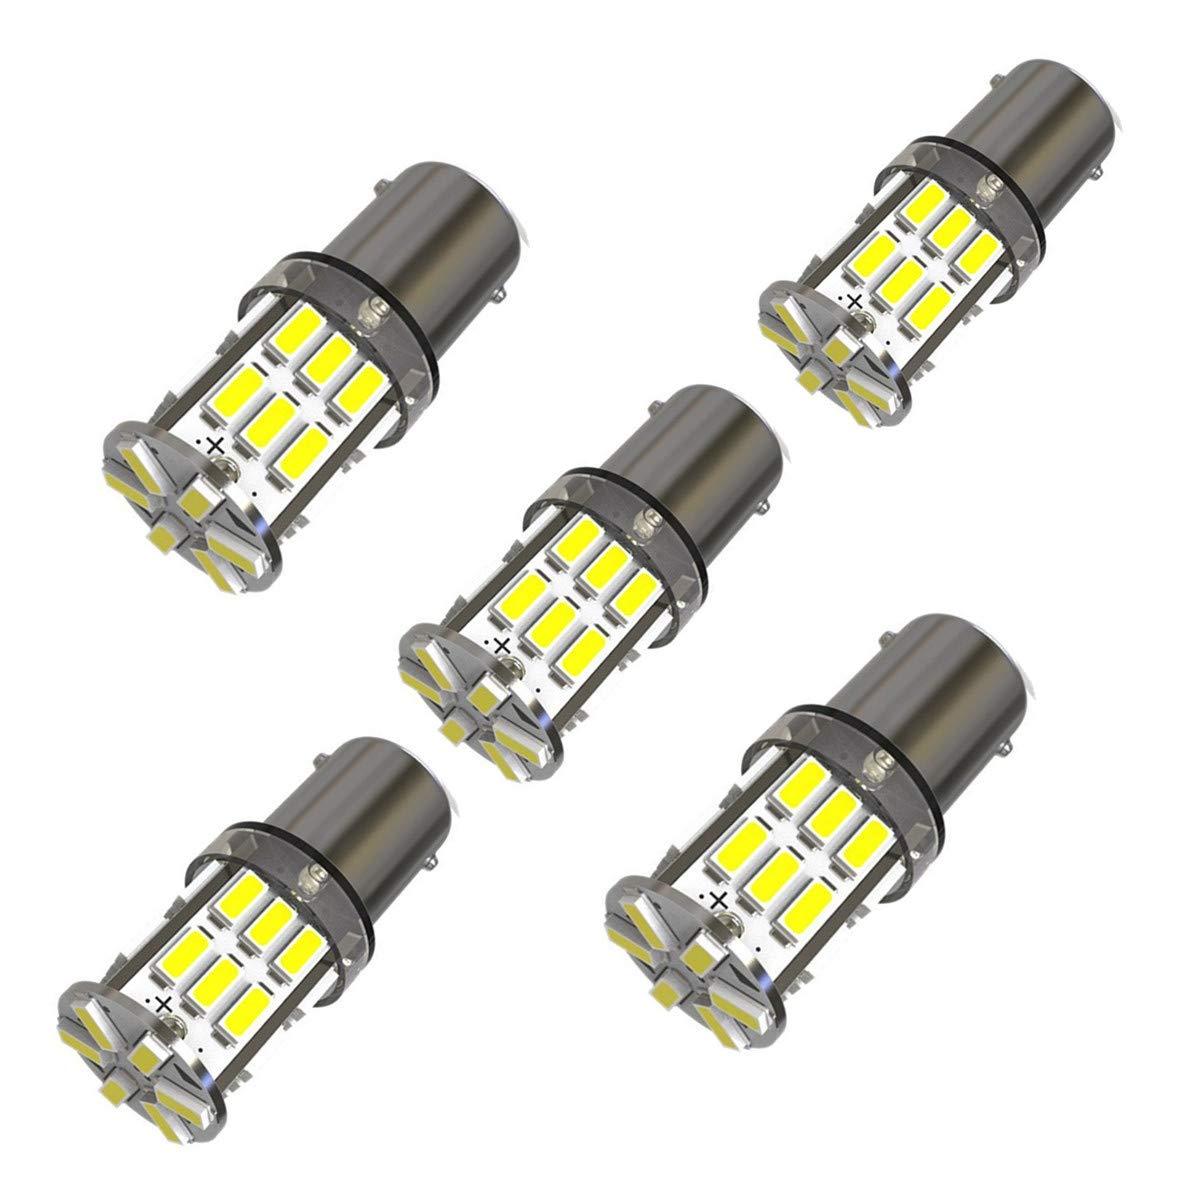 KAFEEK 5×Super Bright BA9 BA9S 1895 53 57 64111 LED Bulbs 30-3014SMD Side Door Courtesy Map Dome Lights,Xenon White